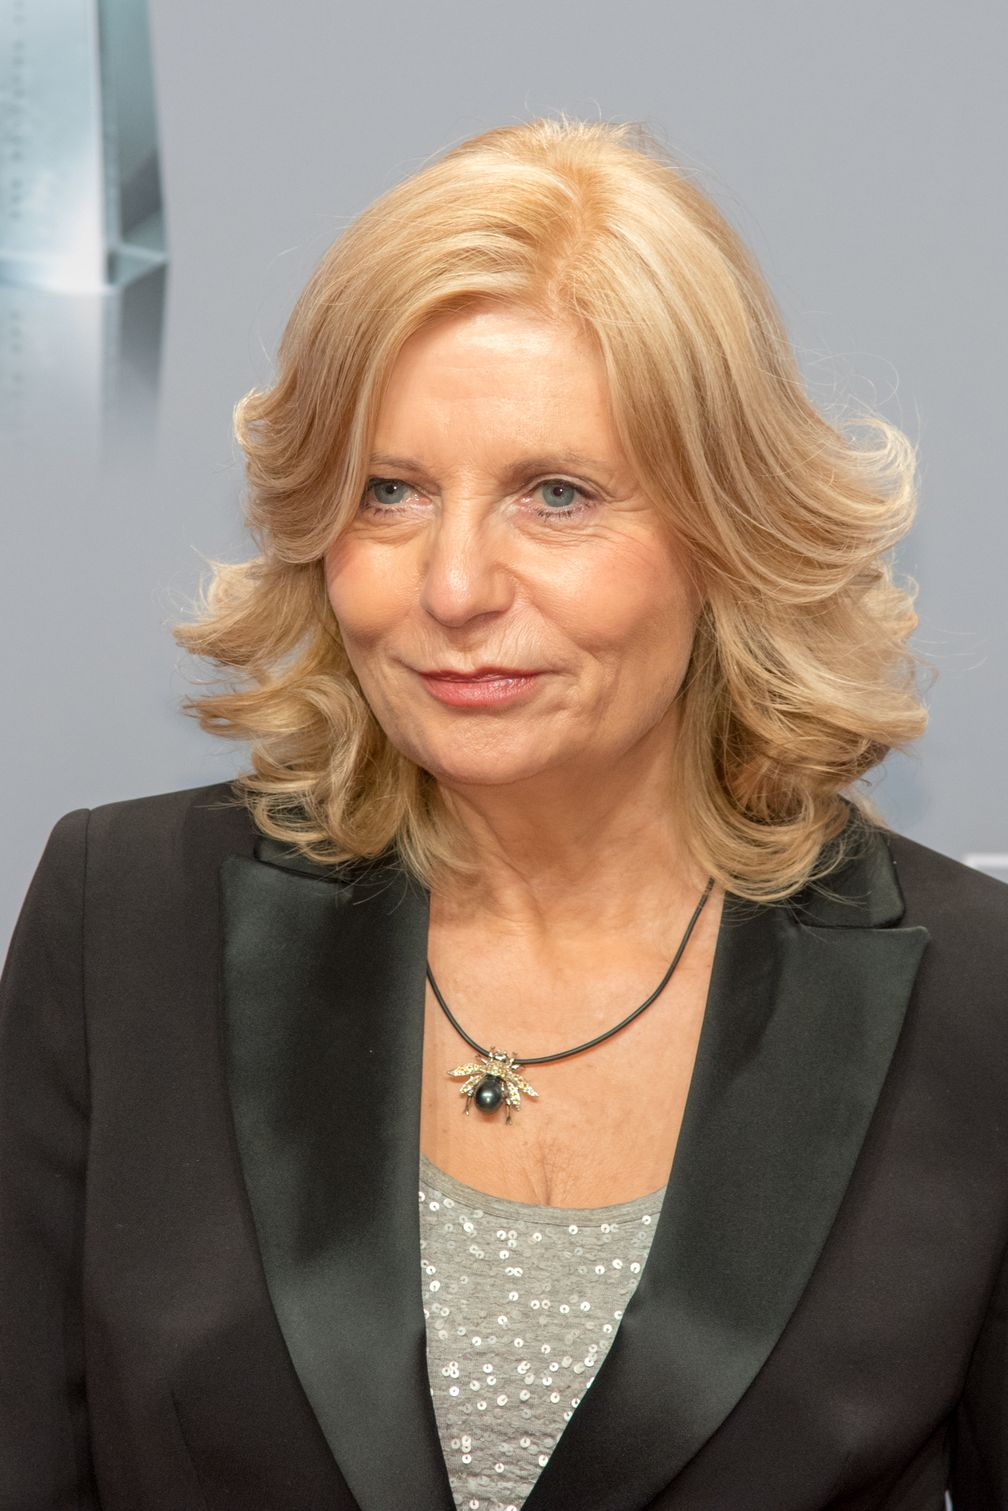 Sabine Postel (2018)